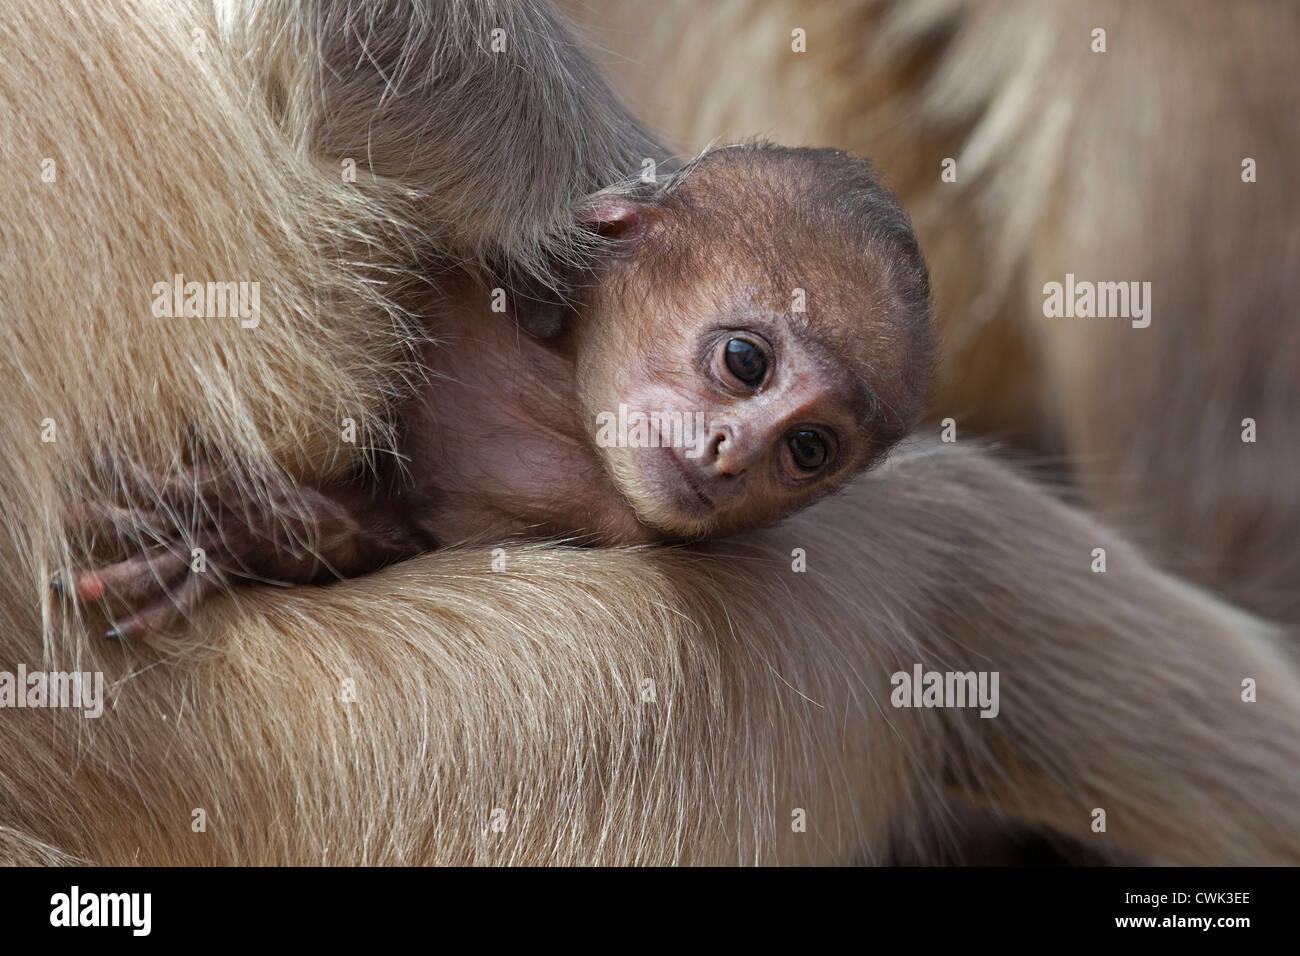 Grigio / langur Hanuman langur (Semnopithecus entellus) azienda baby, il Parco nazionale di Ranthambore, Sawai Madhopur, Immagini Stock